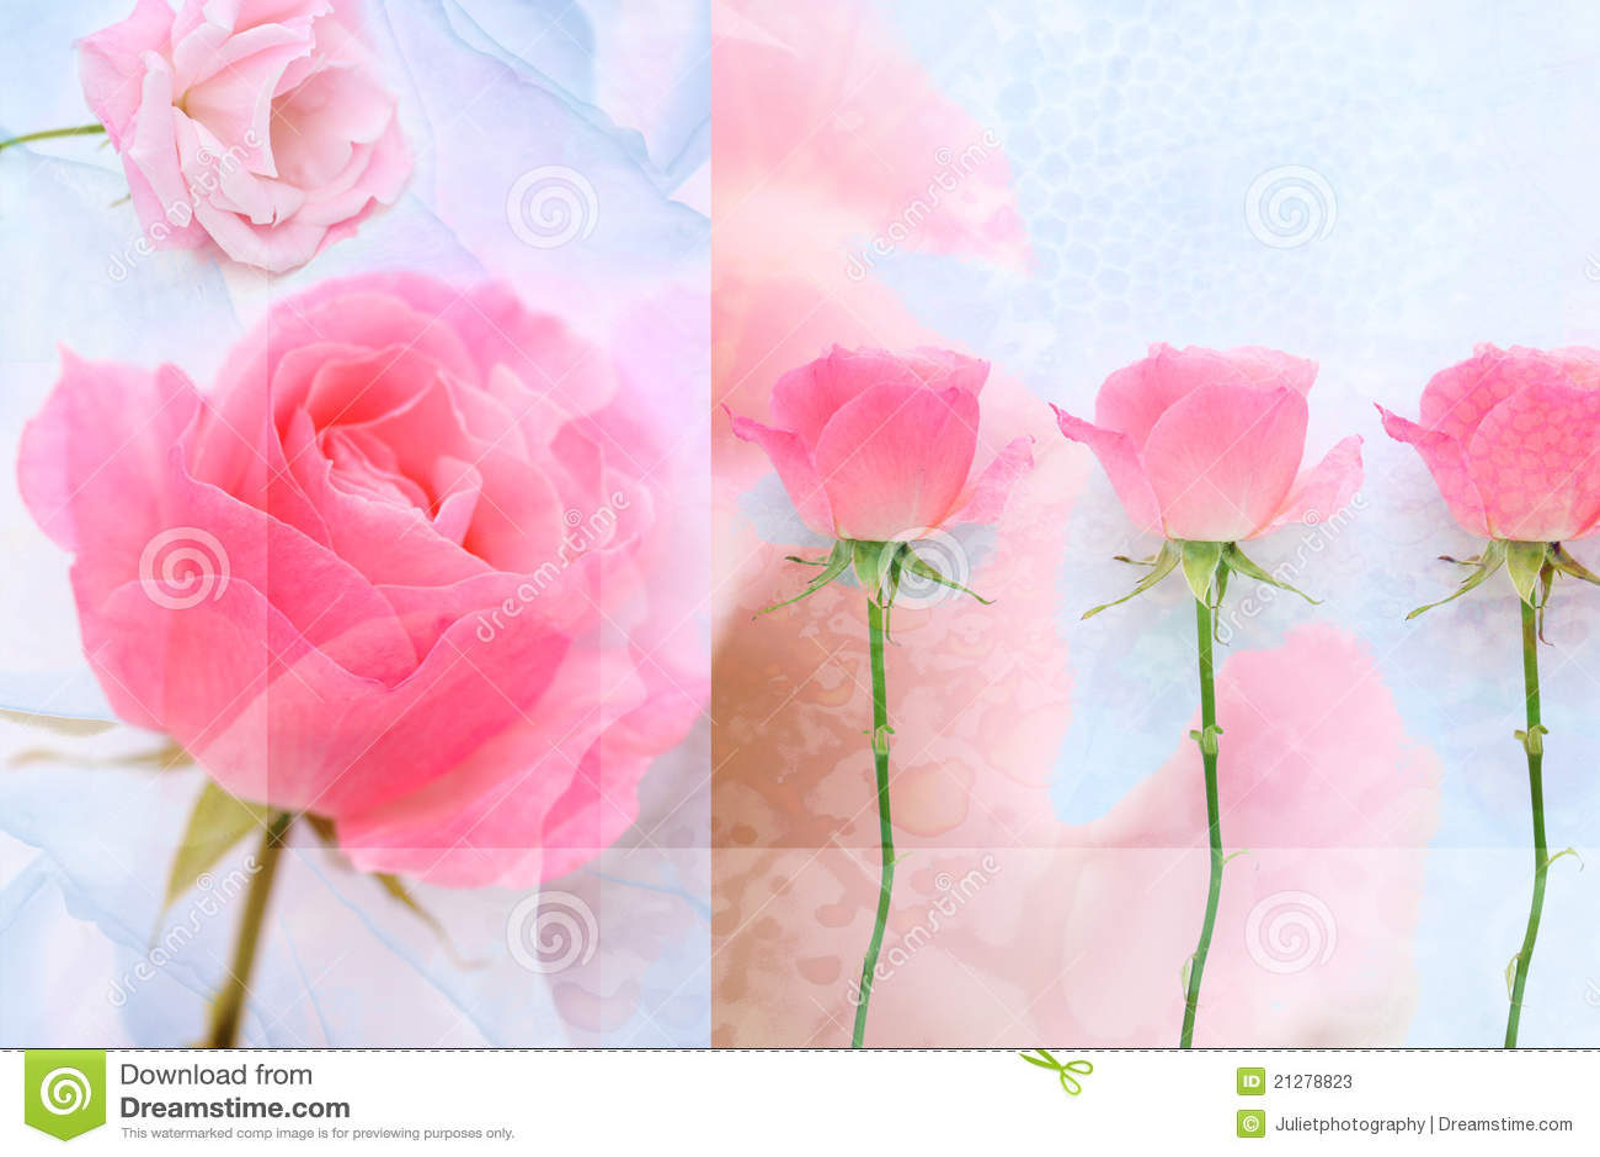 Lovey Pink Rose Wet